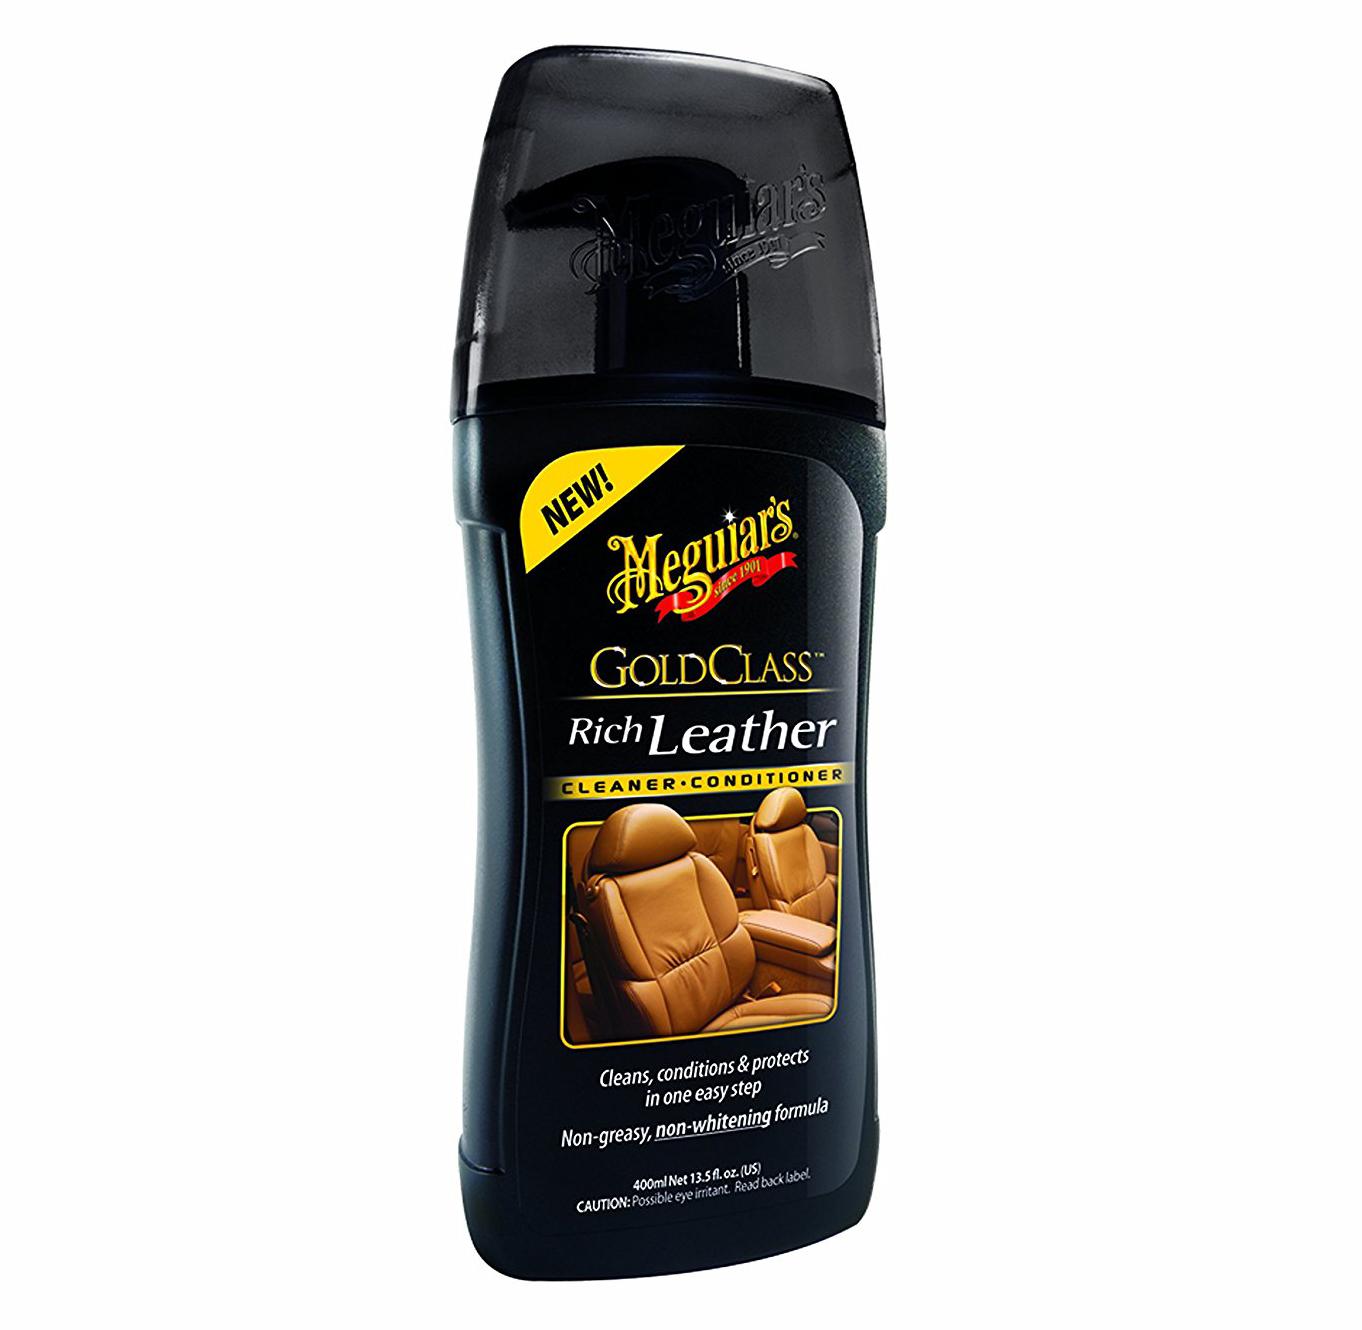 Gel phục hồi và bảo dưỡng da nội thất xe Meguiar's G17914 Gold Class Rich Leather Cleaner & Conditioner - 400ml